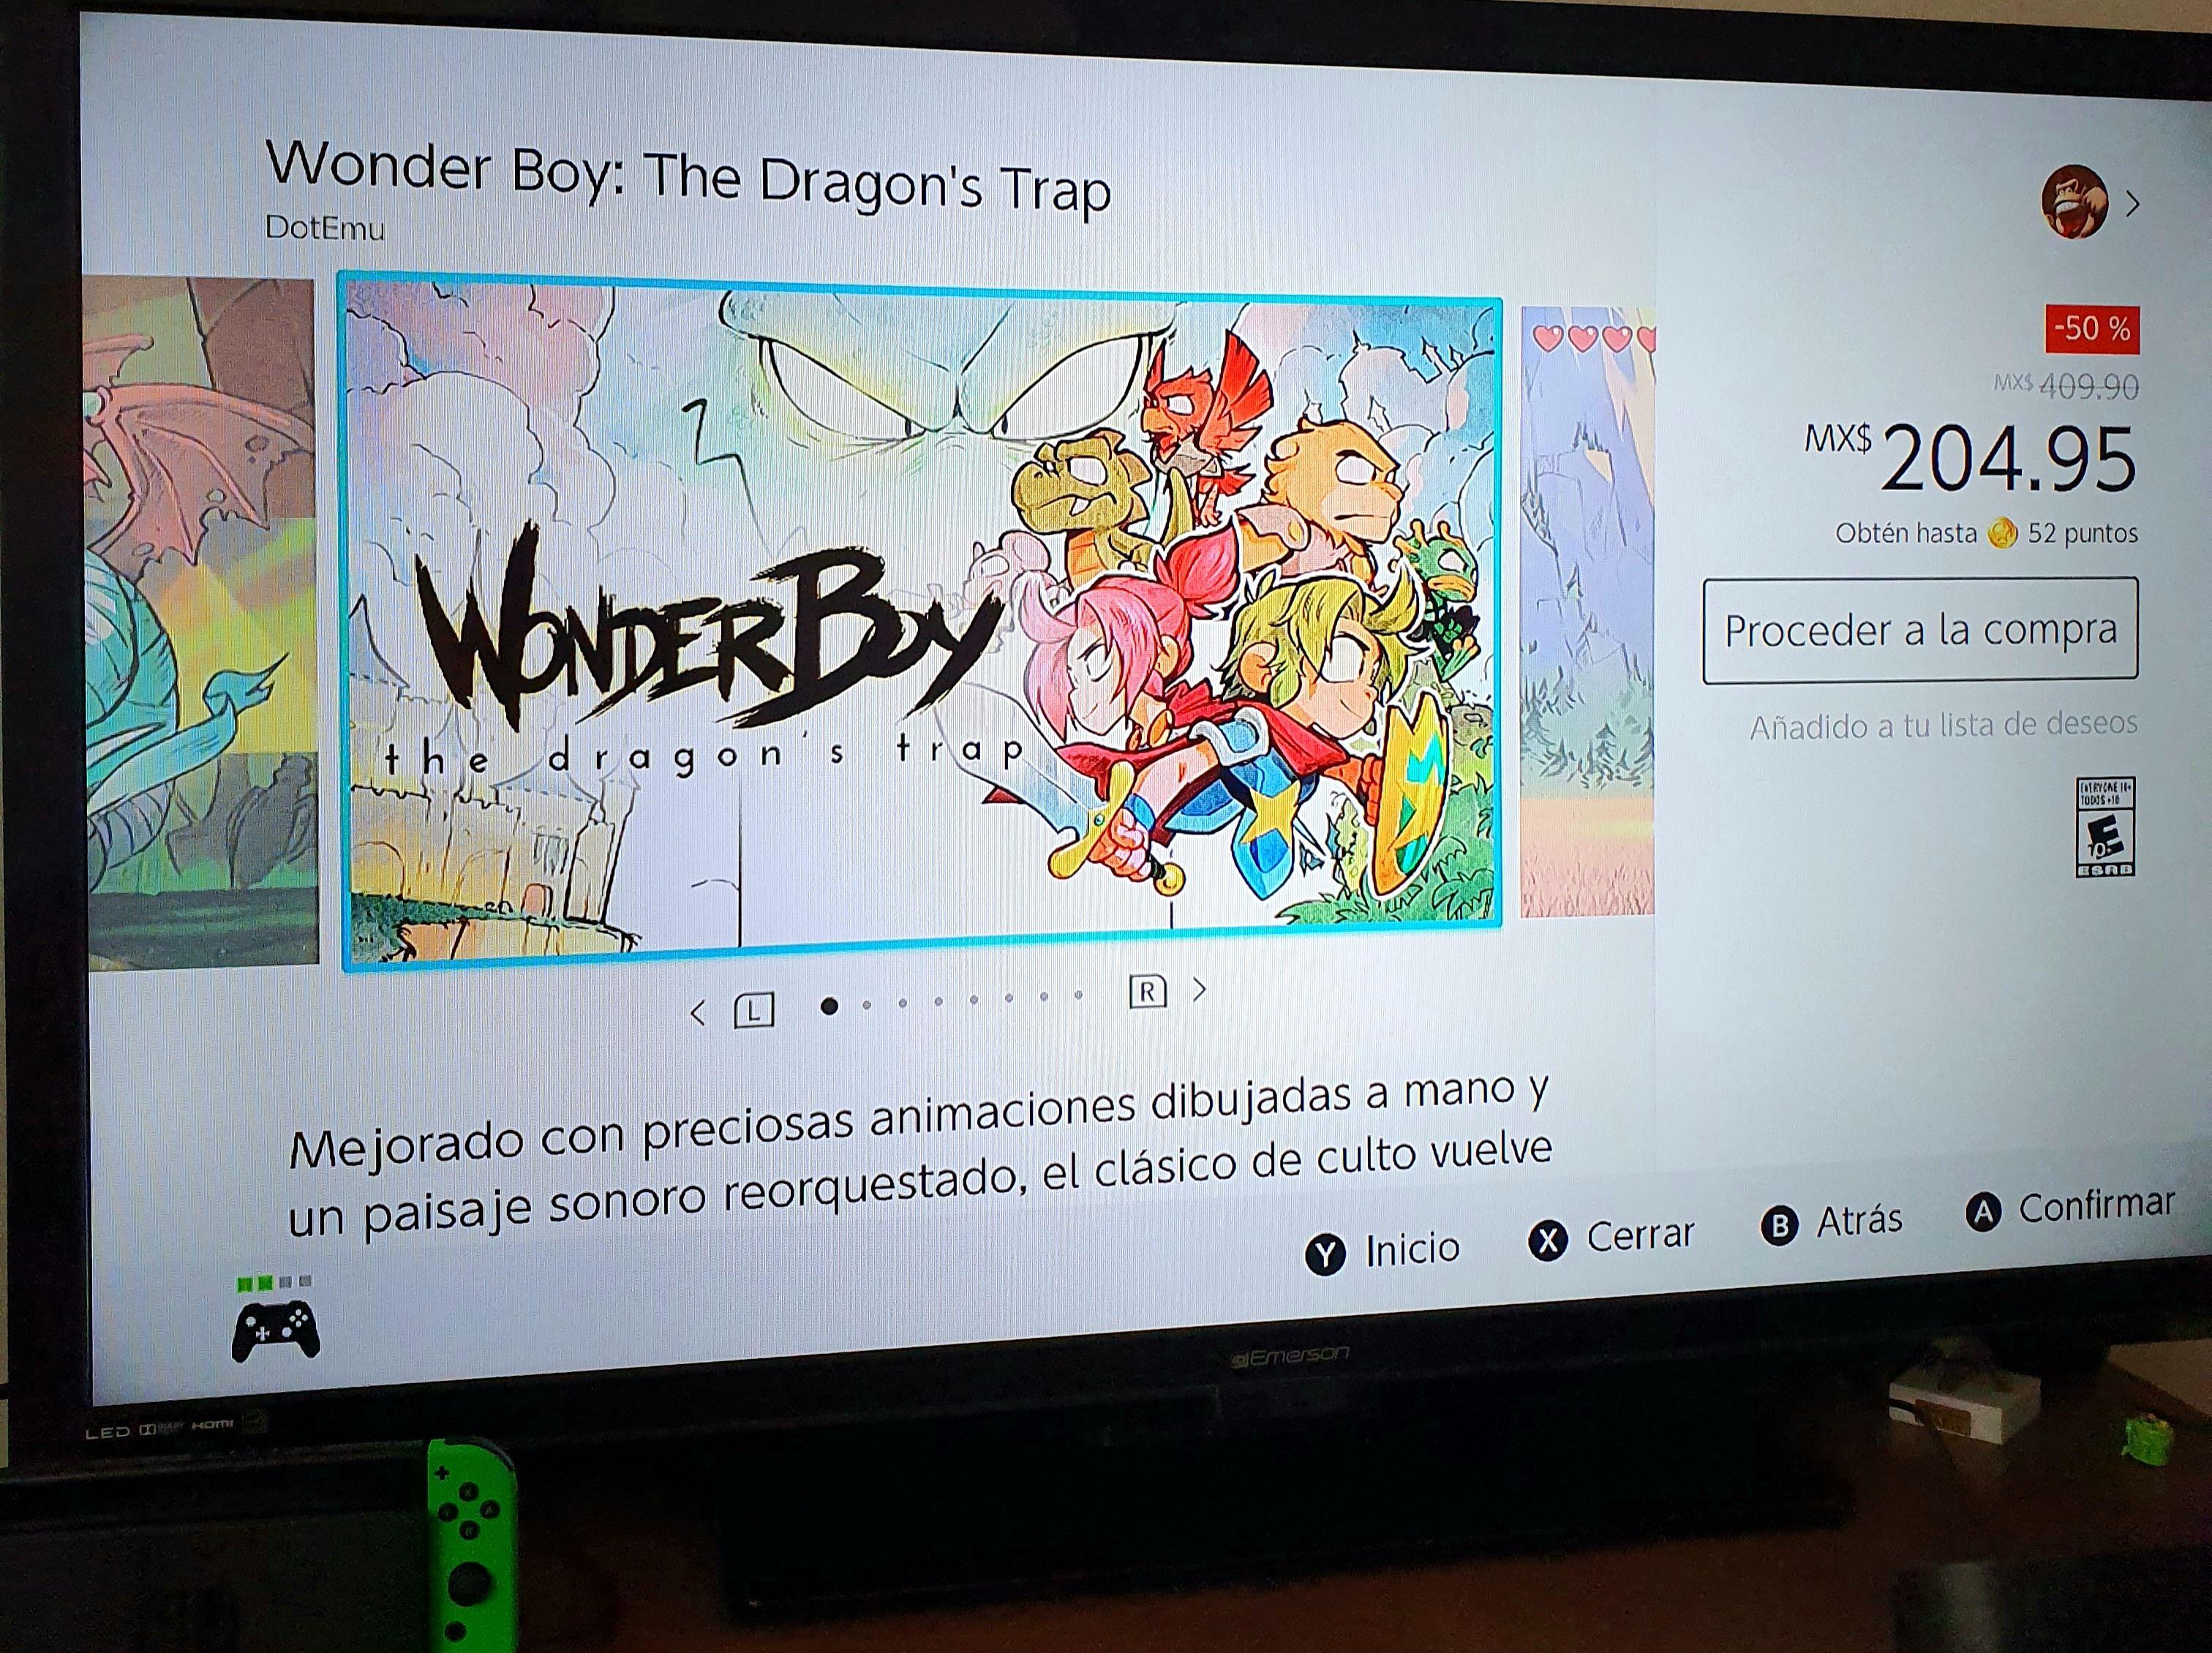 Nintendo eShop: Wonder Boy The dragon's trap